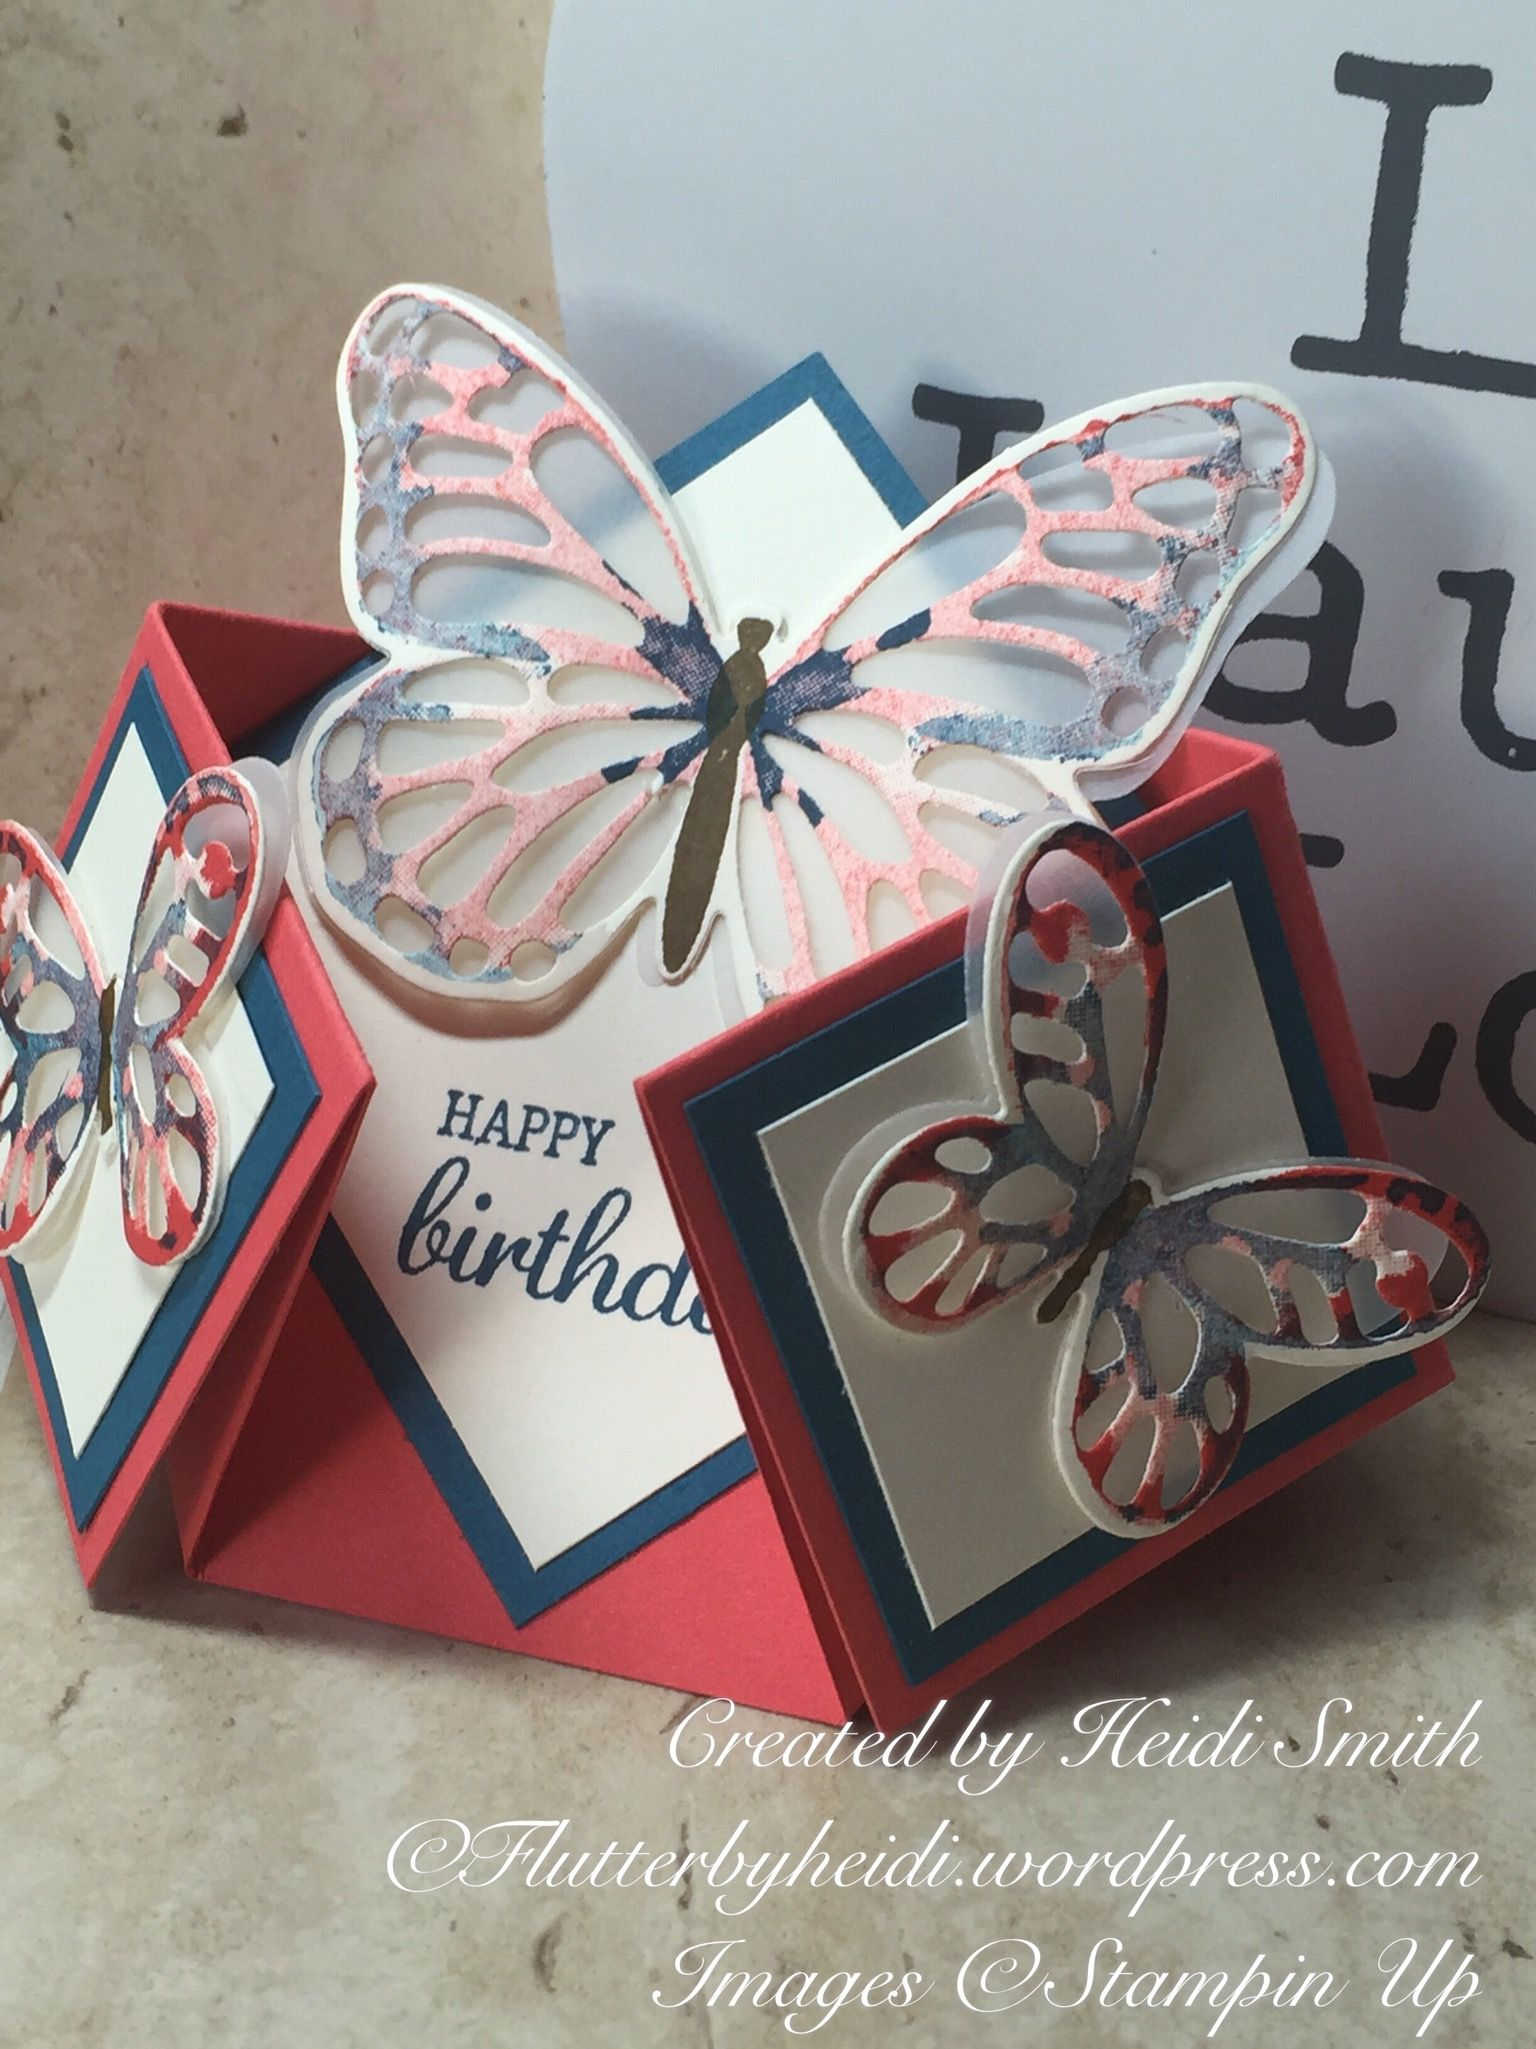 Sunday Scoring Double Diamond Fold Fun Fold Cards Shaped Cards Greeting Cards Handmade